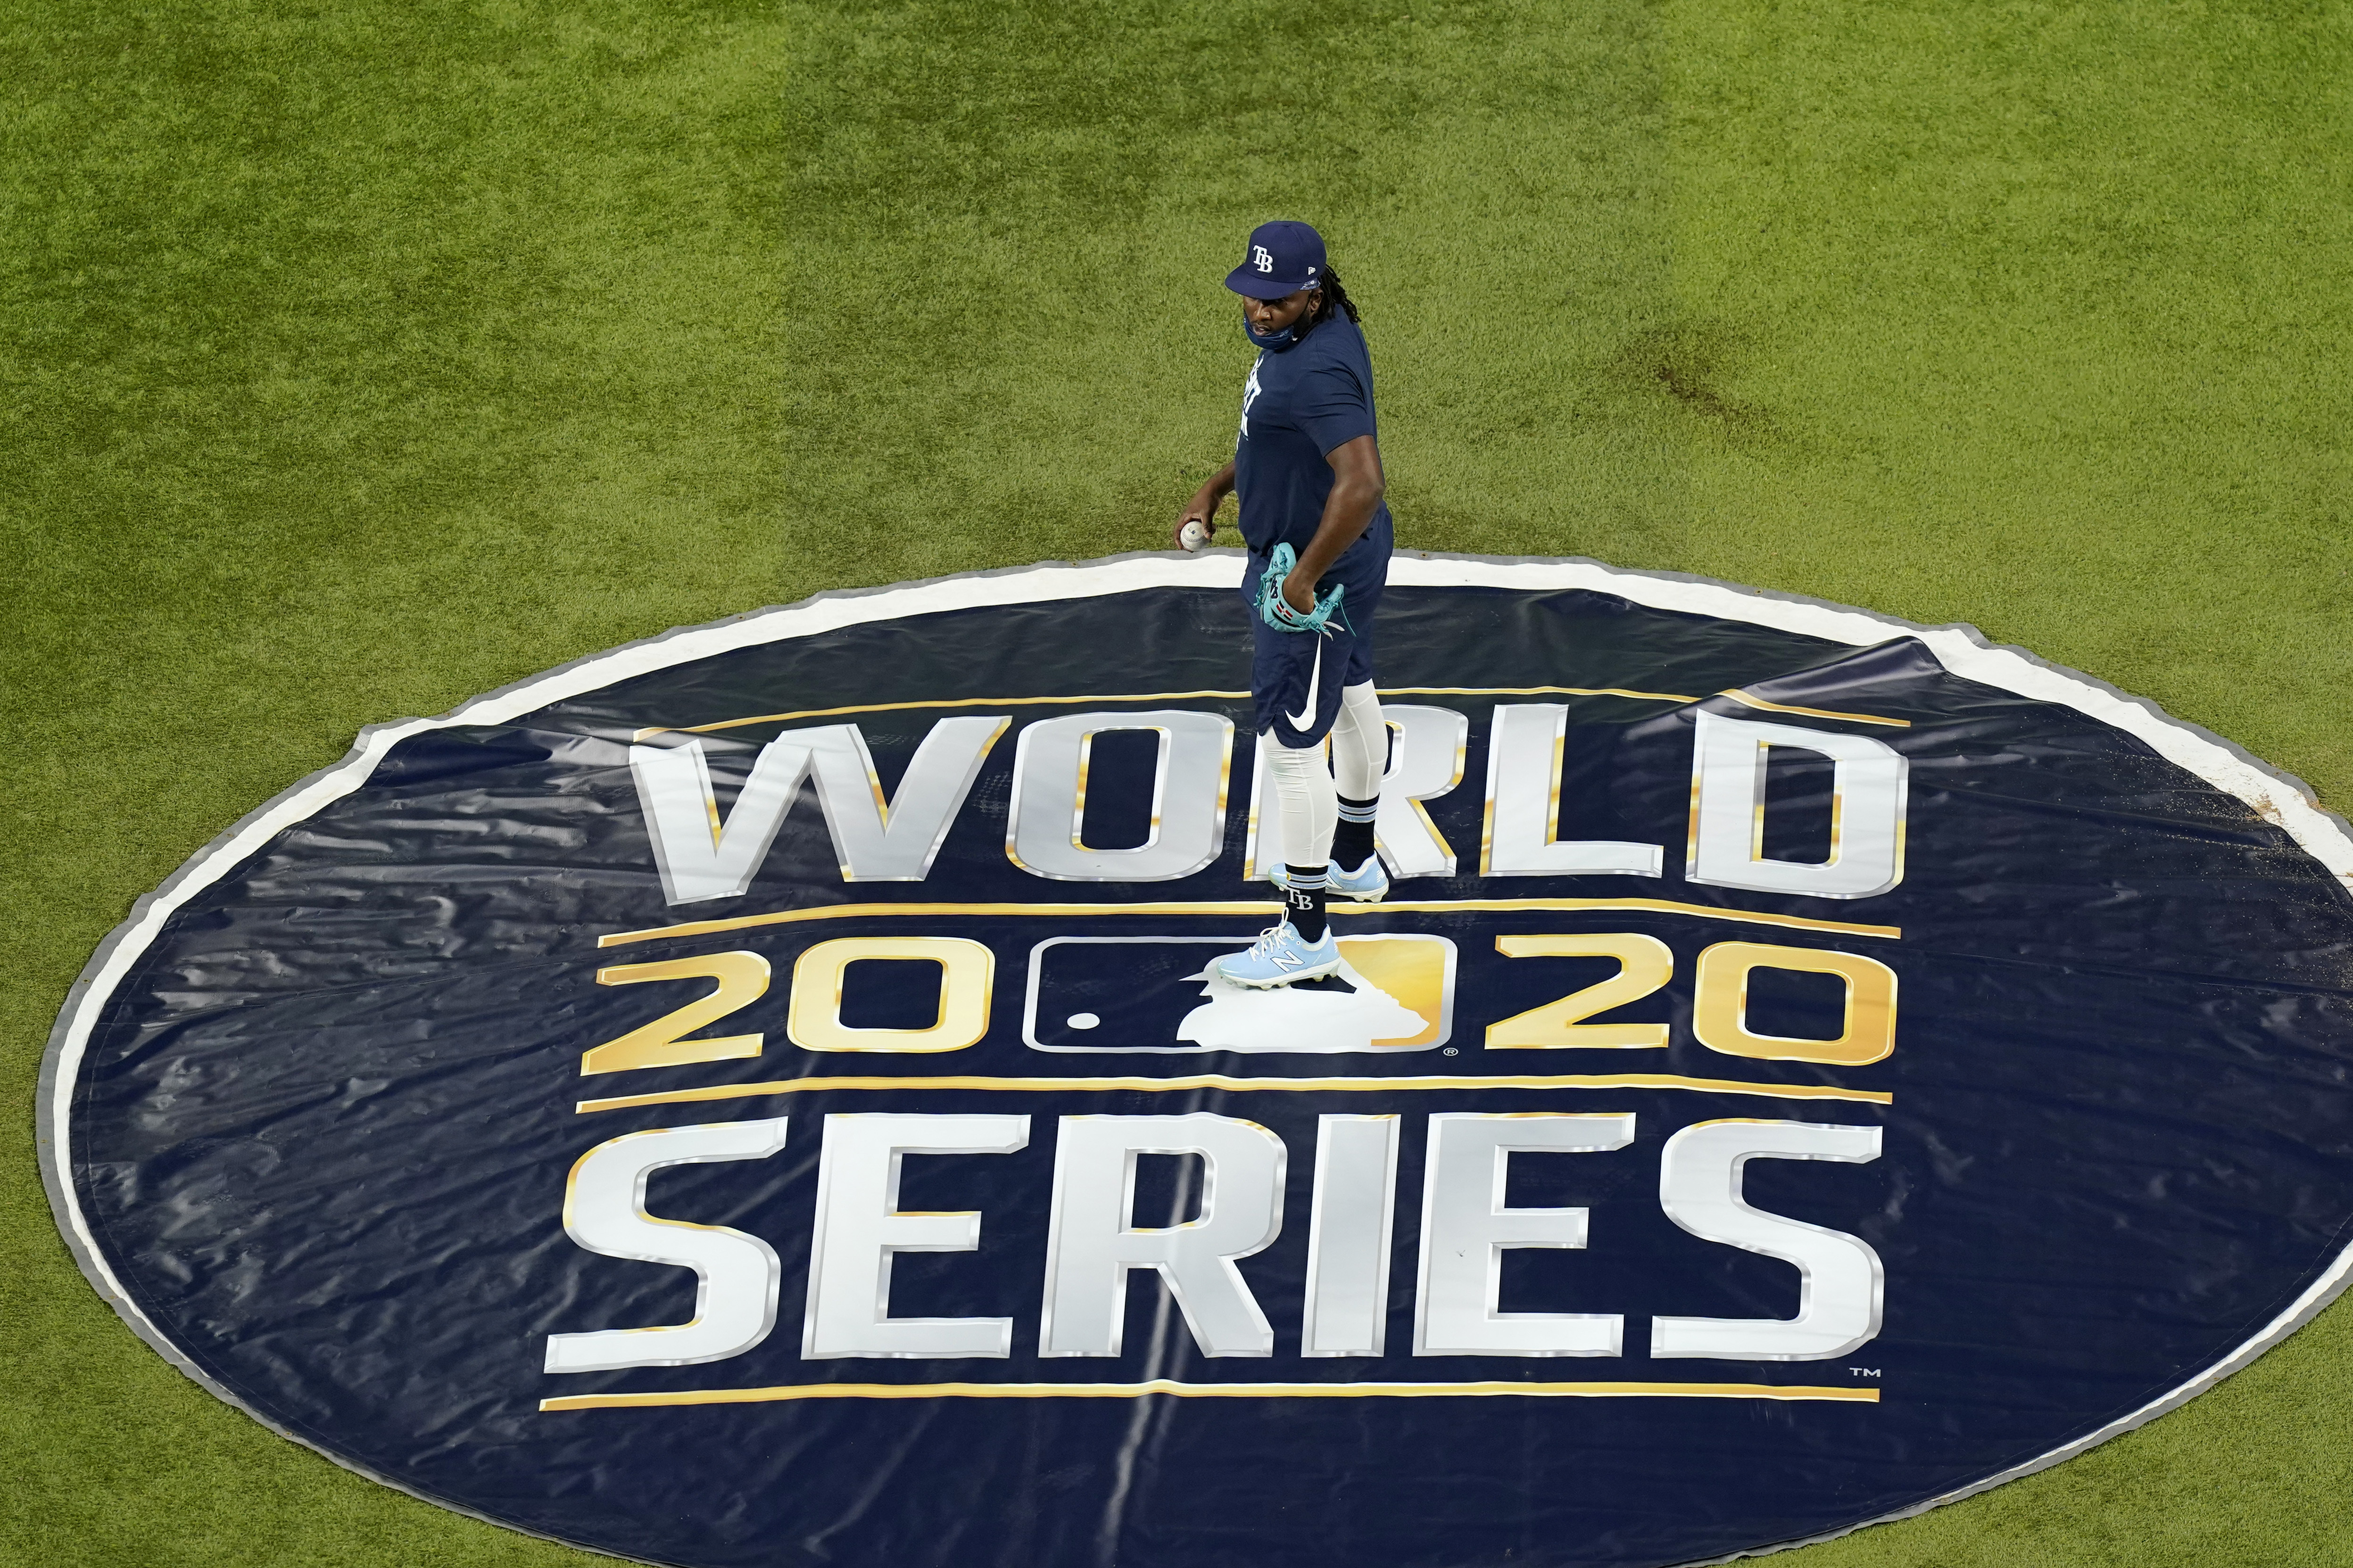 world series 2020 picks predictions for los angeles dodgers vs tampa bay rays nj com 2